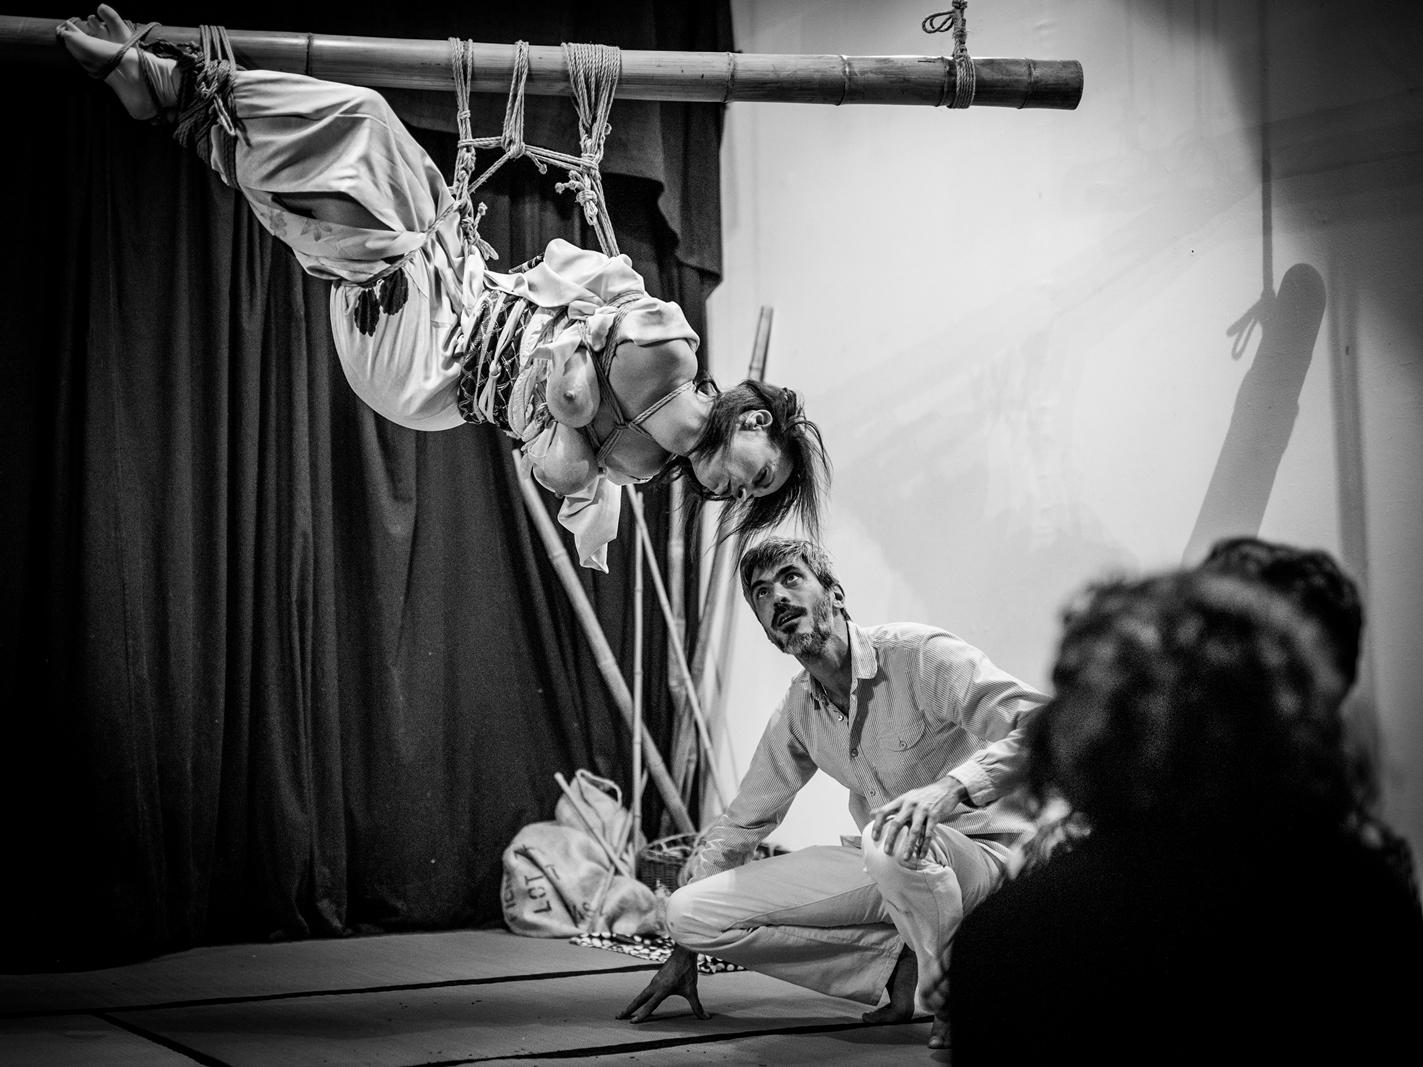 Performance bondage japonais Lyon 2017 Pyrrhus 11